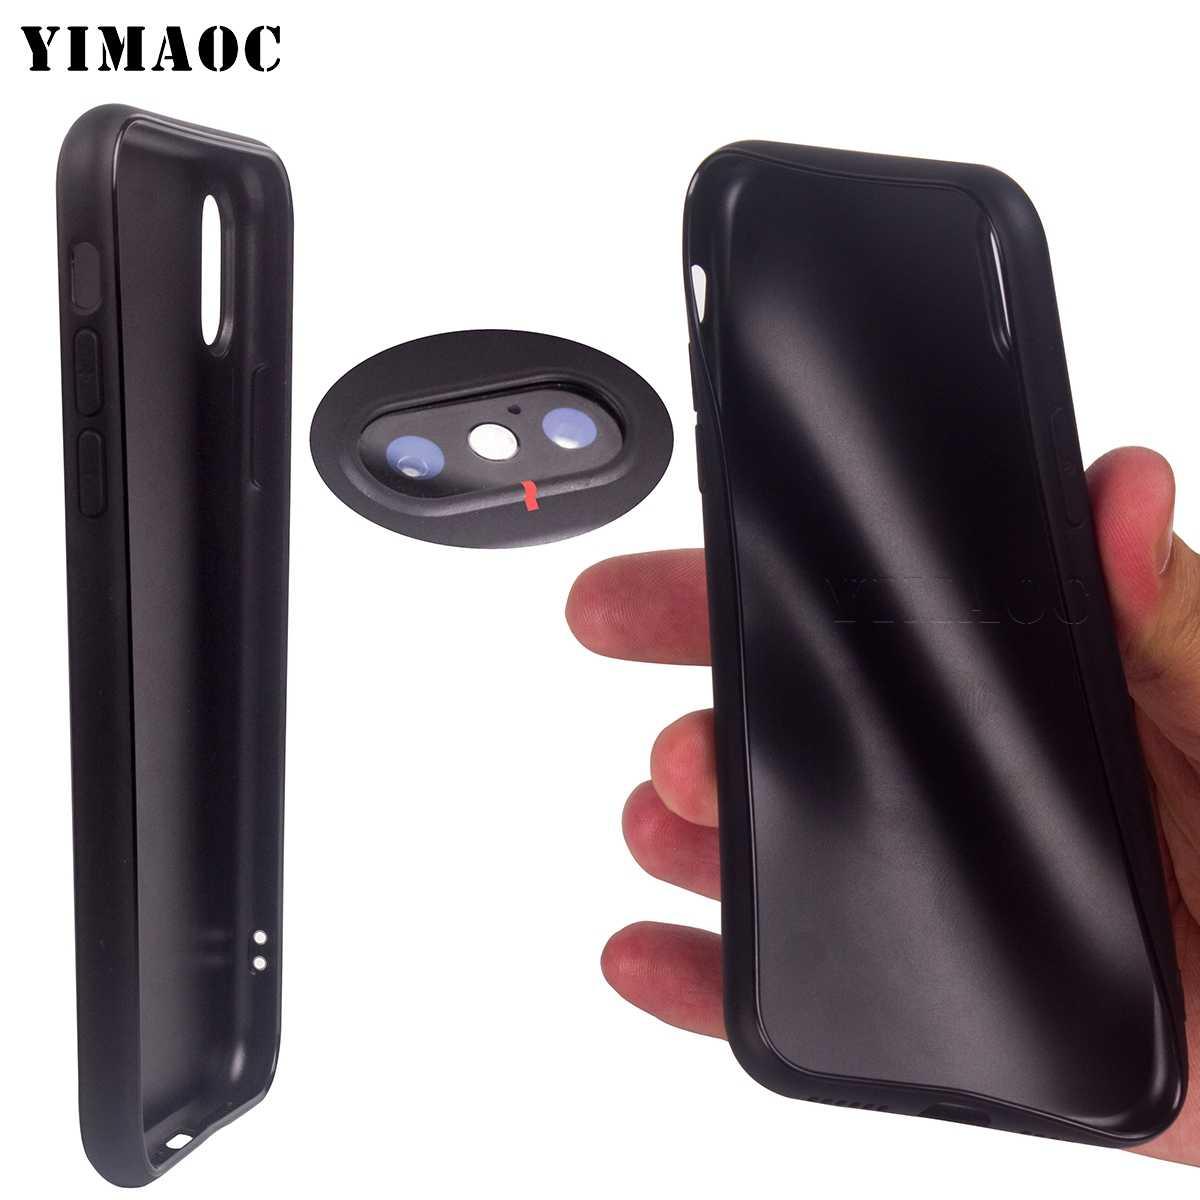 YIMAOC ฮังการีฮังการีโรมาเนียอินโดนีเซียธงซิลิโคนนุ่มกรณีสำหรับ iPhone 11 Pro XS MAX XR X 8 7 6 6S plus 5 5 S SE